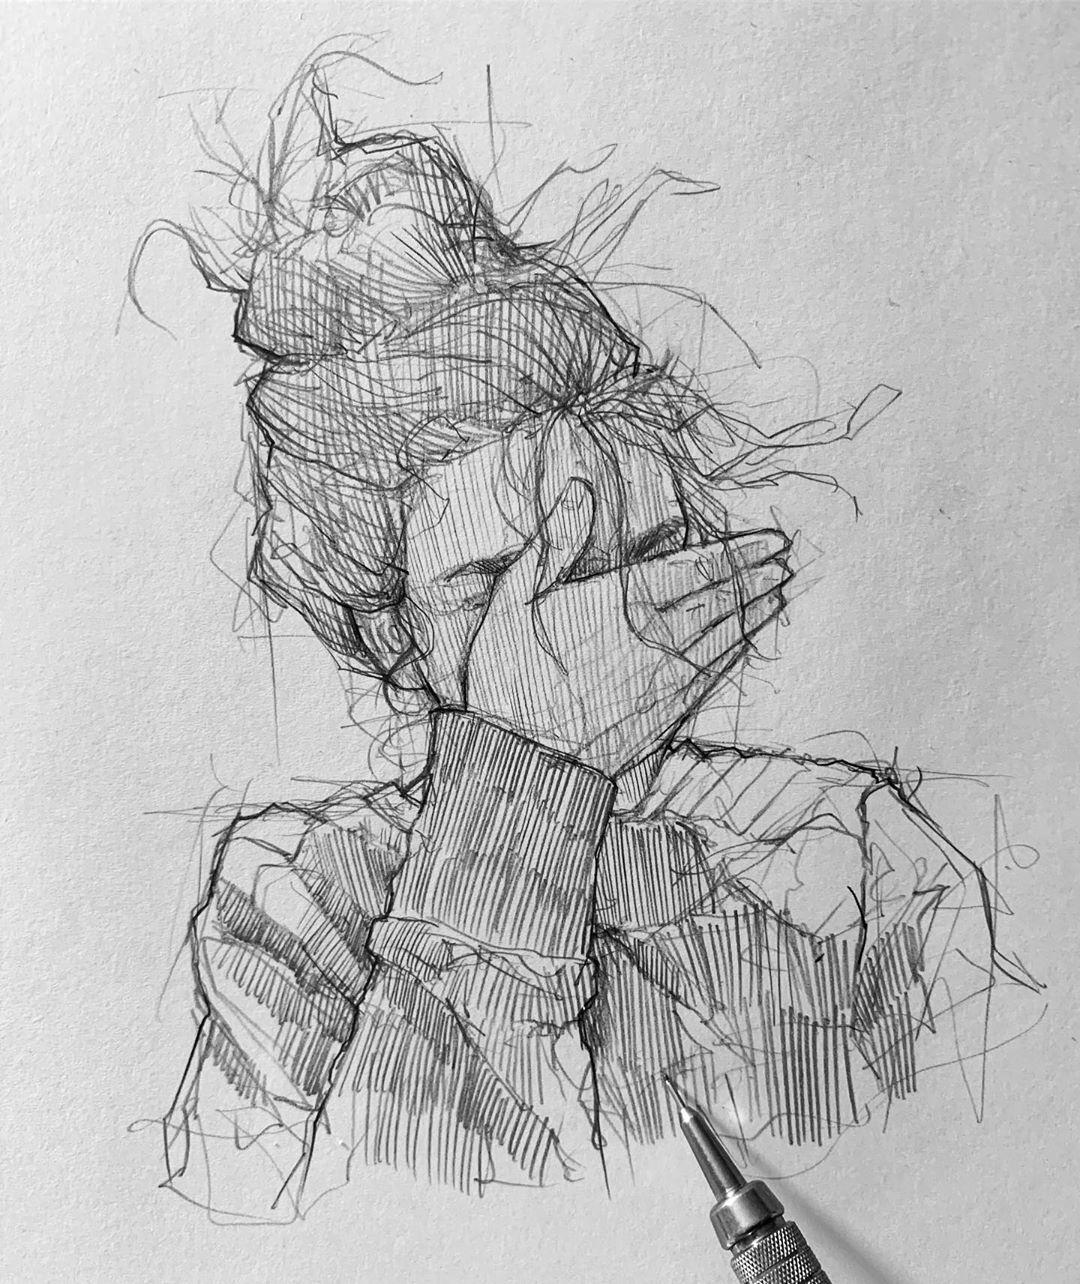 Efrain Malo в Instagram: «When u can't draw eyes 😅 #maloart #sketching #graphgear500»